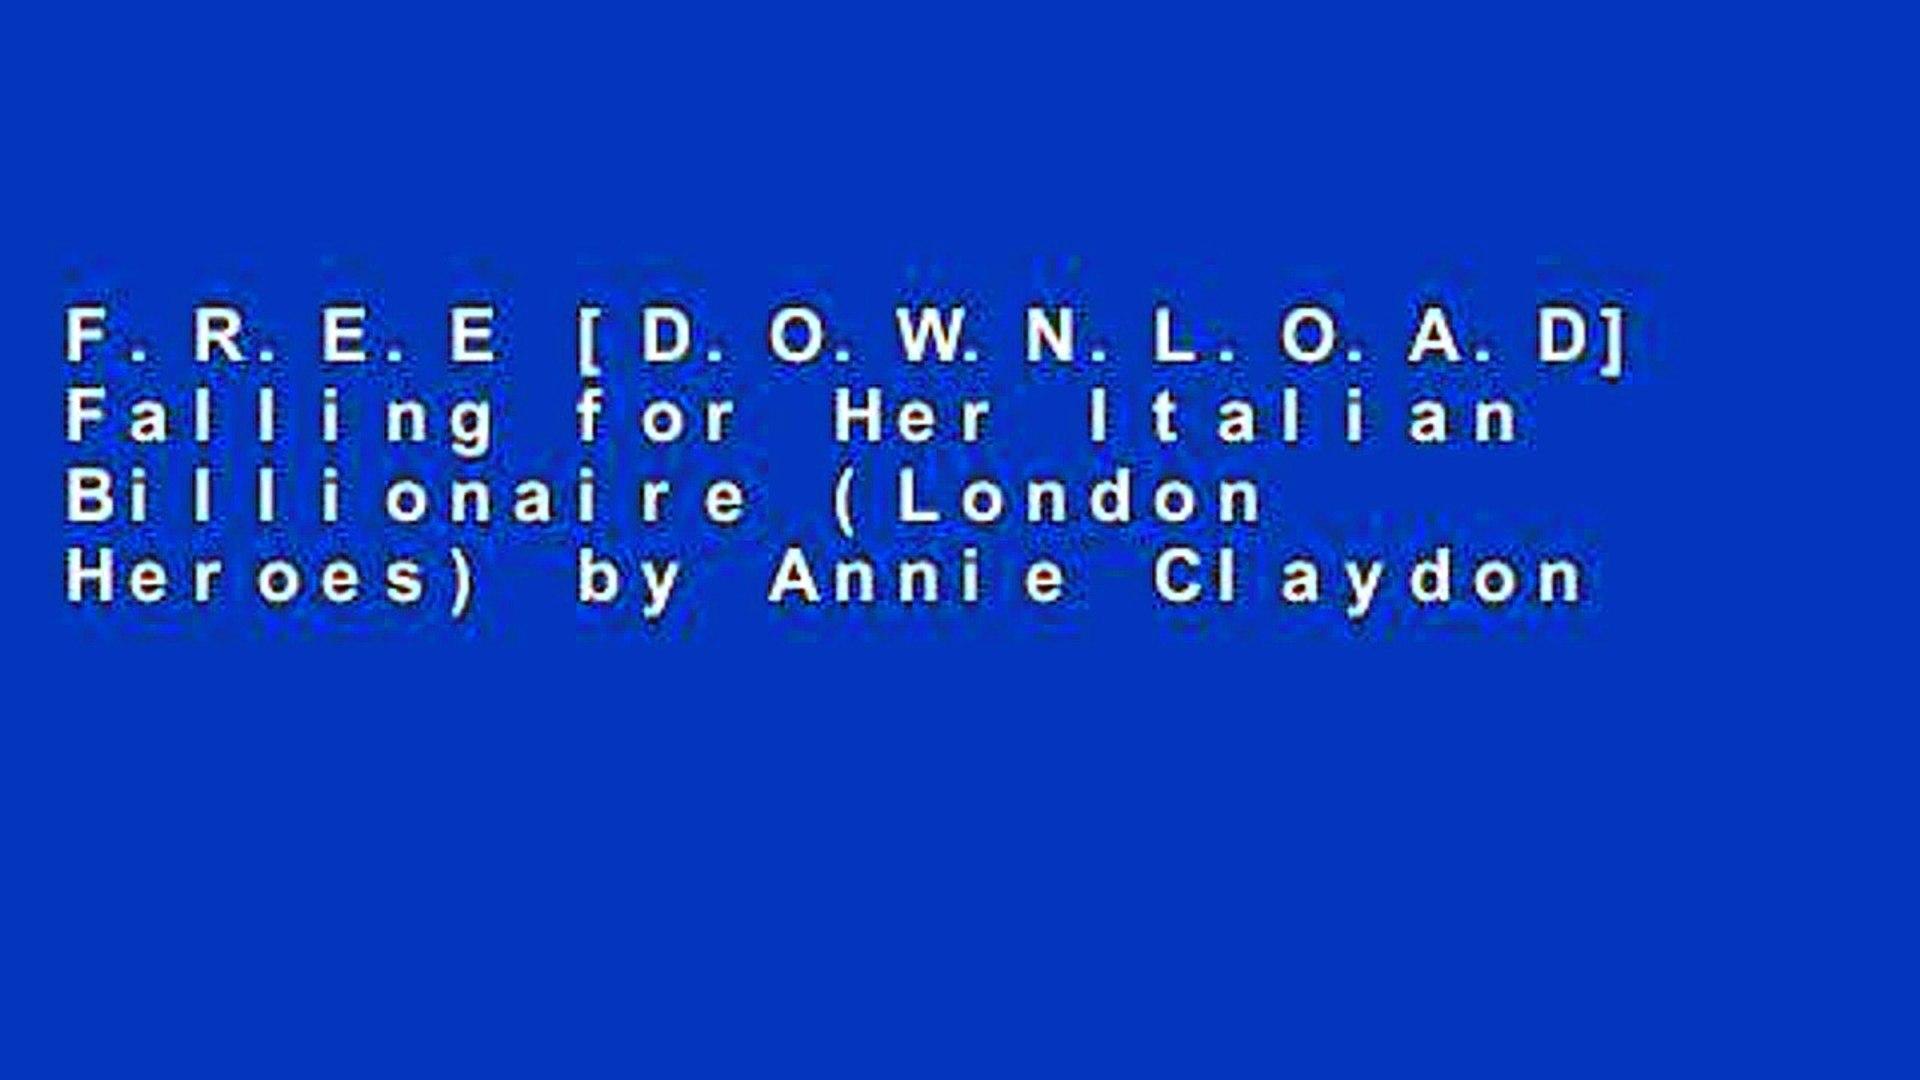 F.R.E.E [D.O.W.N.L.O.A.D] Falling for Her Italian Billionaire (London Heroes) by Annie Claydon